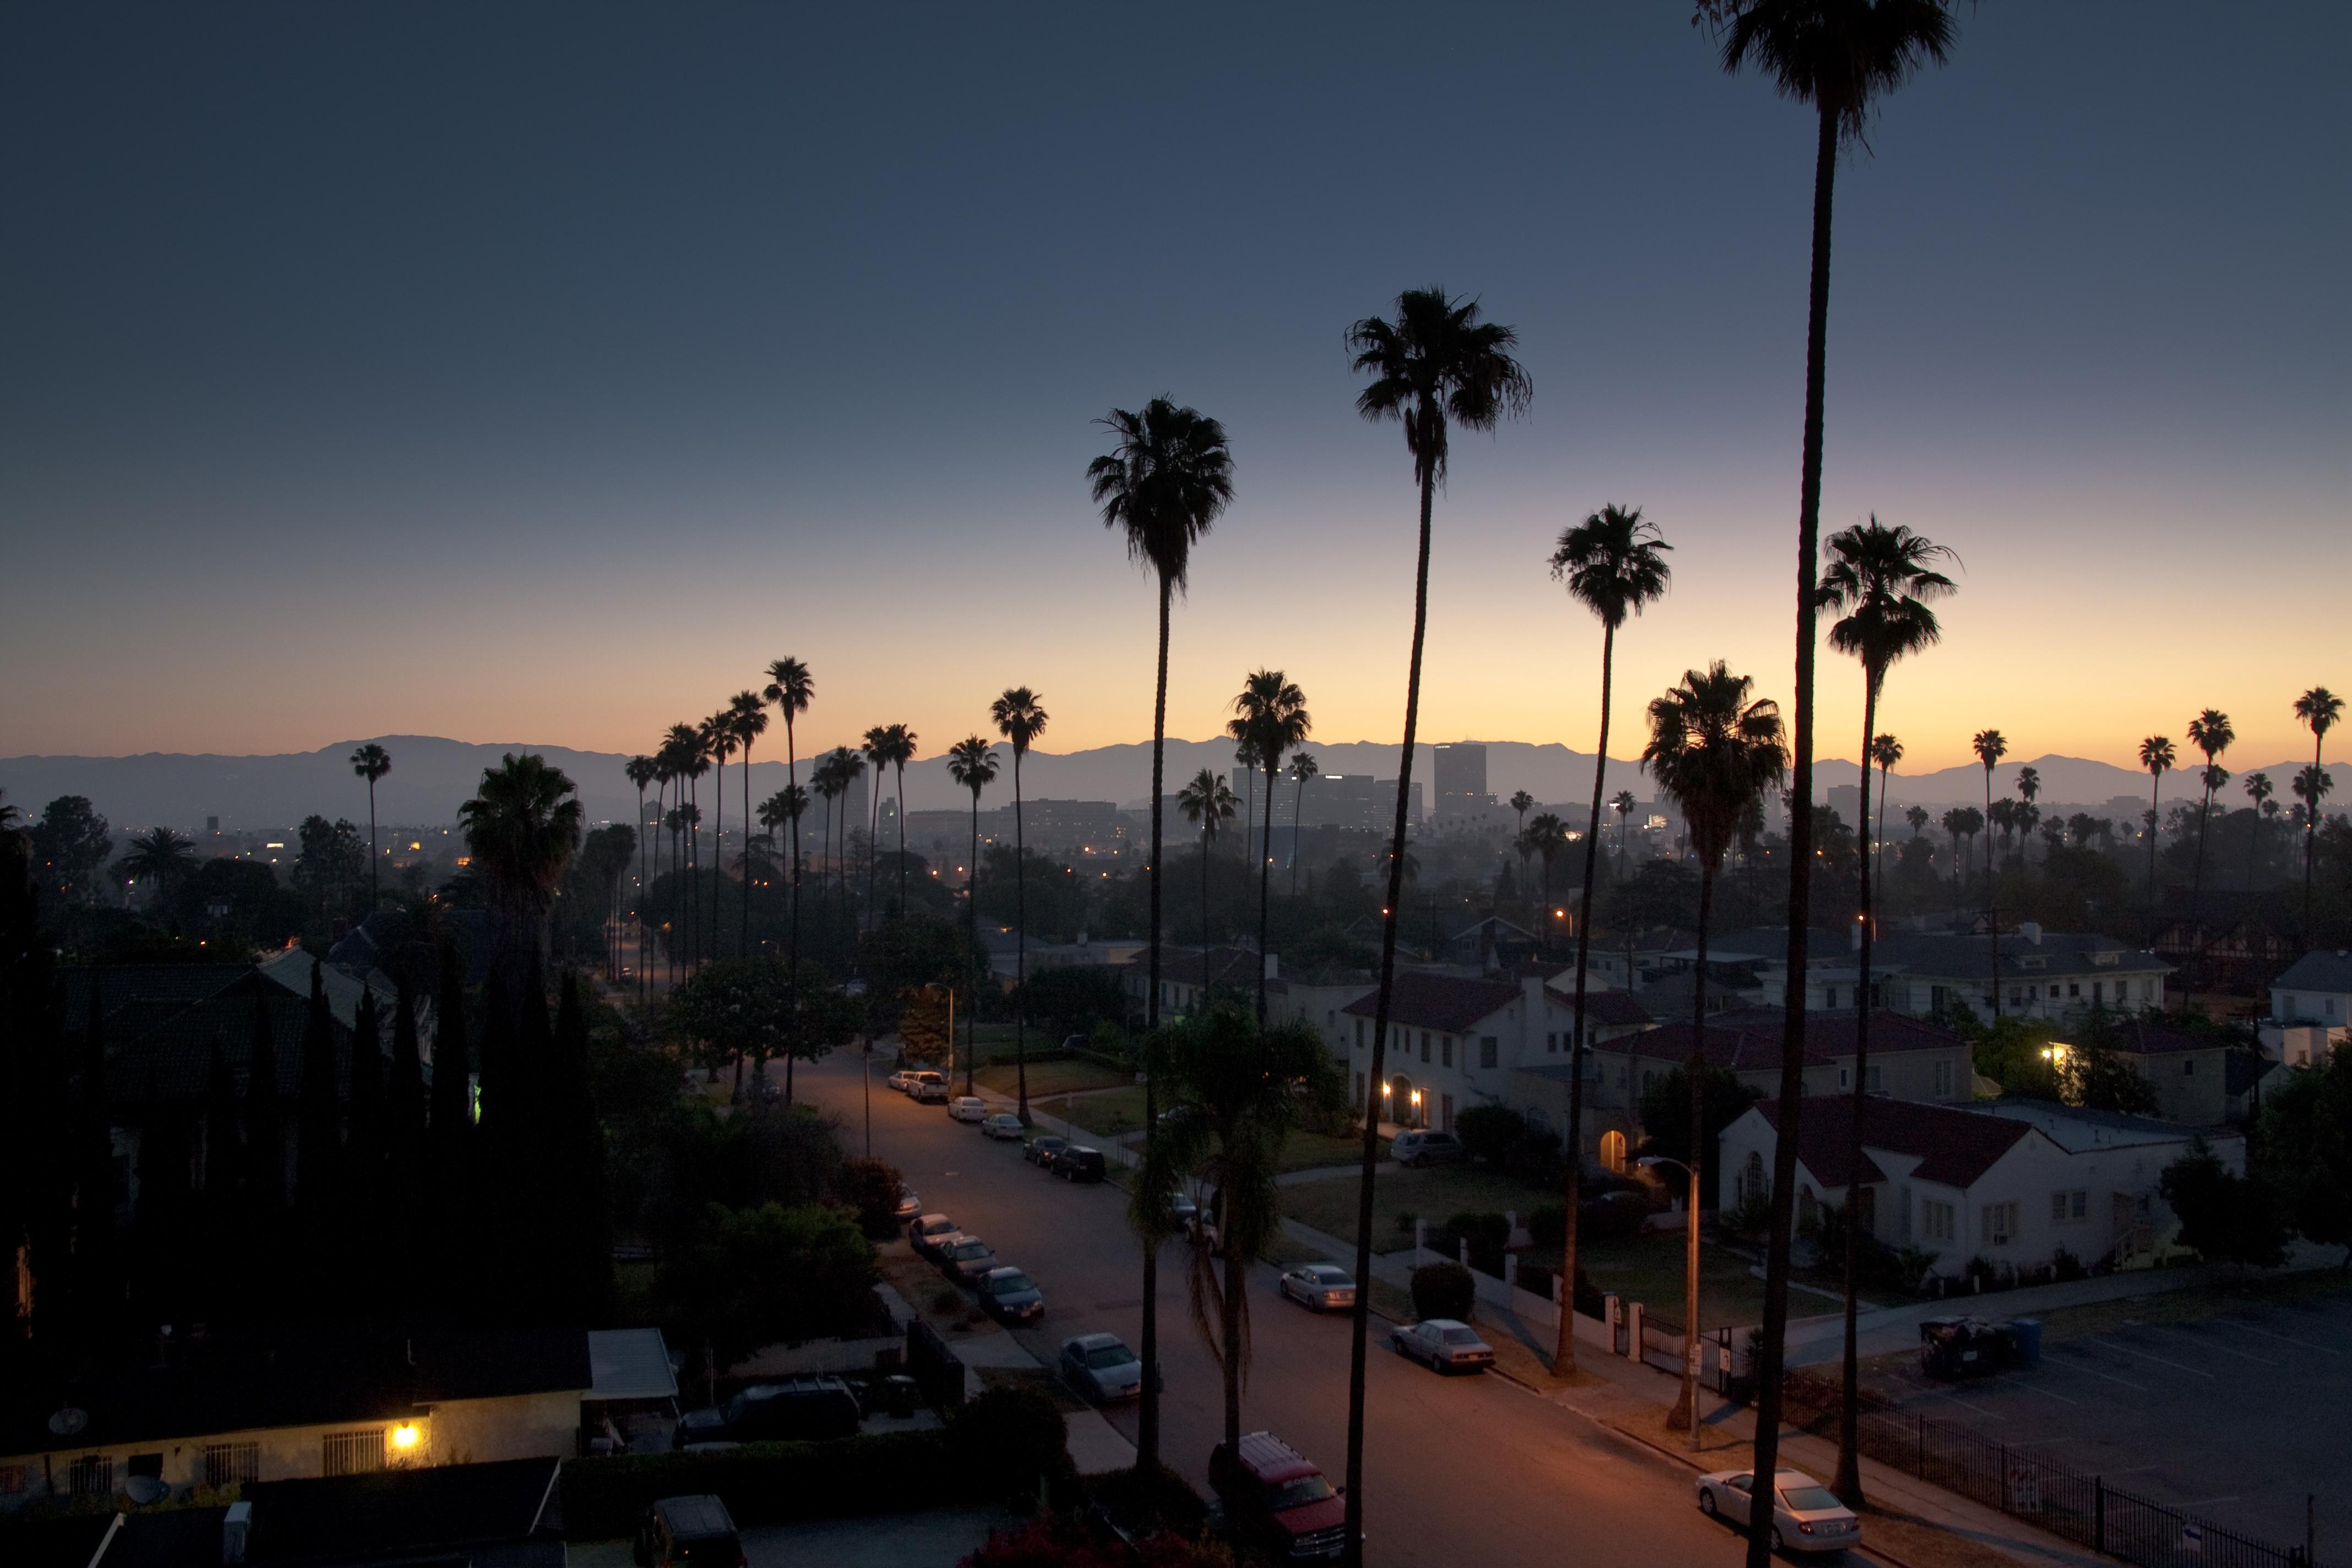 california los angeles street palms wallpaper   bullshft   oh my god 4272x2848